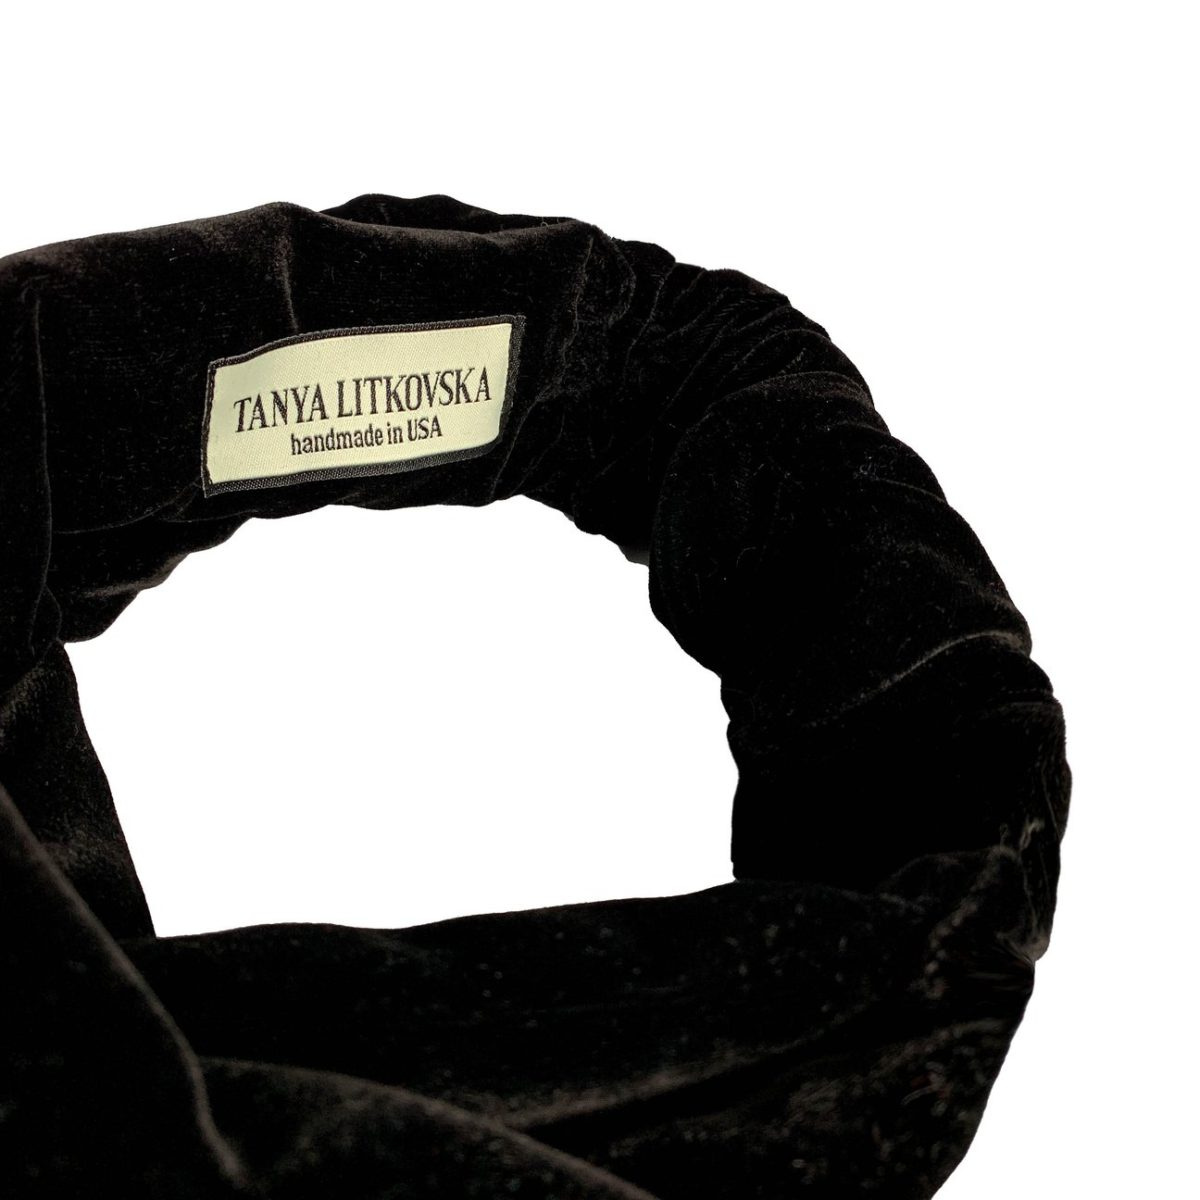 Turban Headband | Black velvet headband